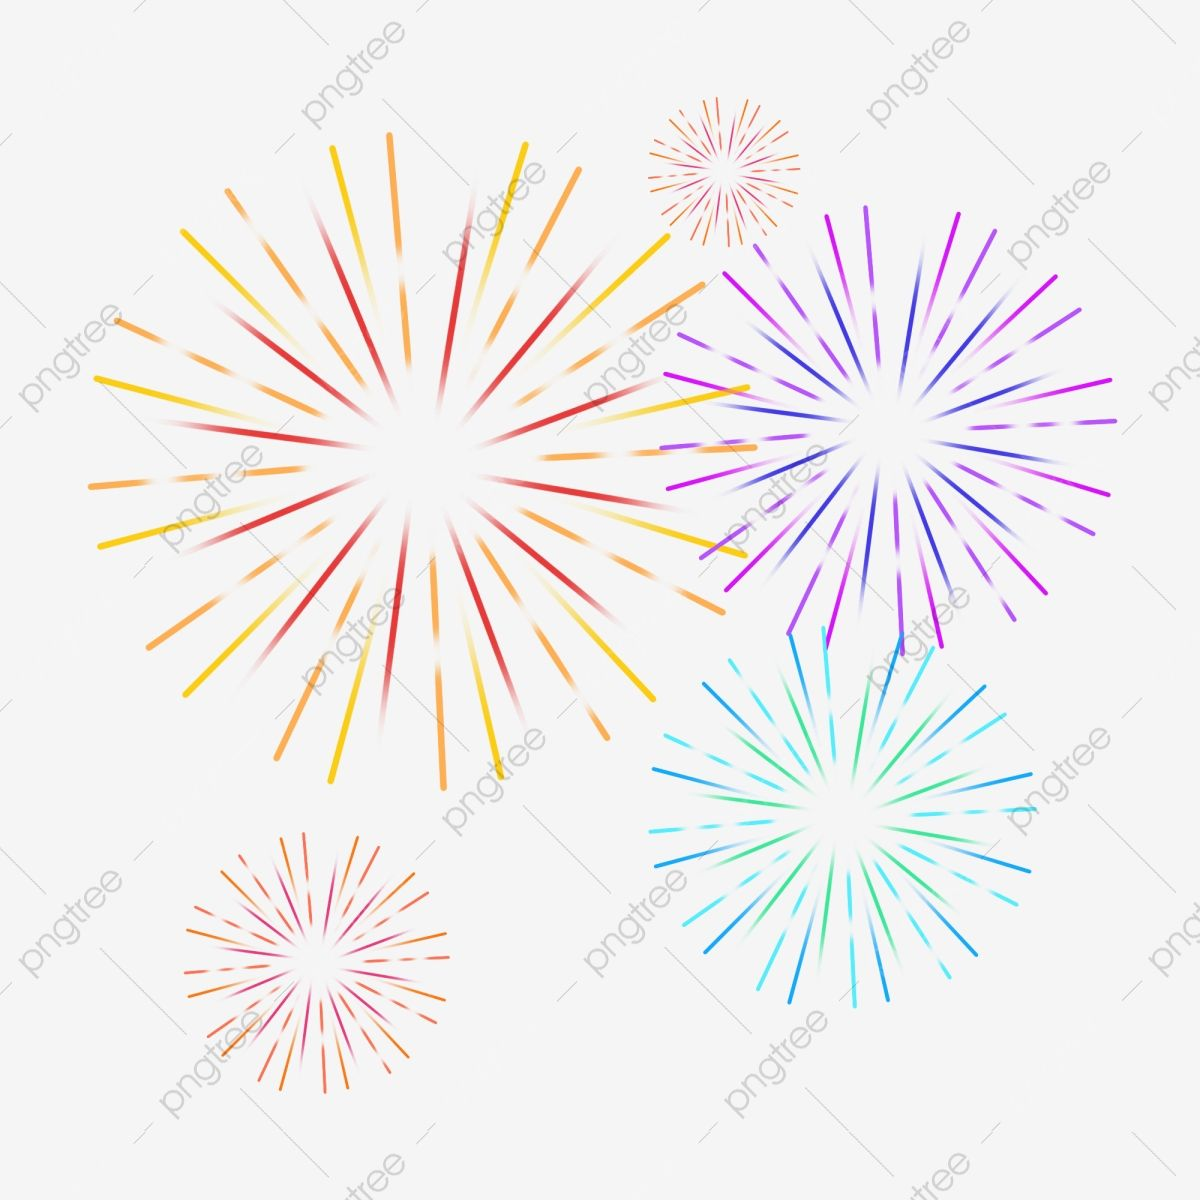 Fireworks Color Festive Cartoon Fireworks Fireworks Bloom Blooming Fireworks Png Transparent Clipart Image And Psd File For Free Download Firework Colors Cartoon Fireworks Fireworks